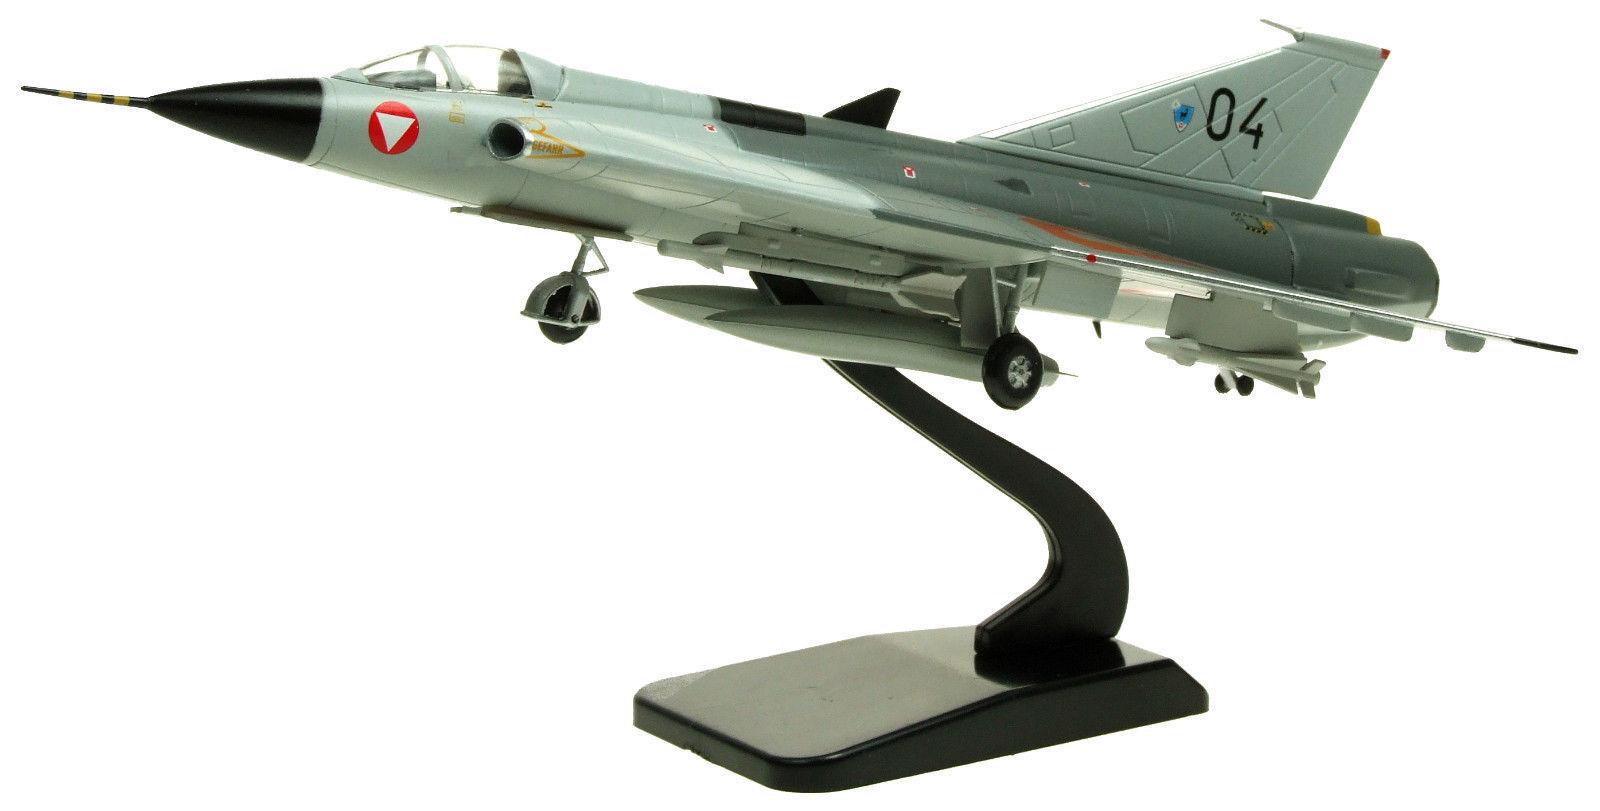 AVIATION72 AV7241006 1 72 SAAB DRAKEN J35 AUSTRIAN AIR FORCE 04 INCLUDING STAND